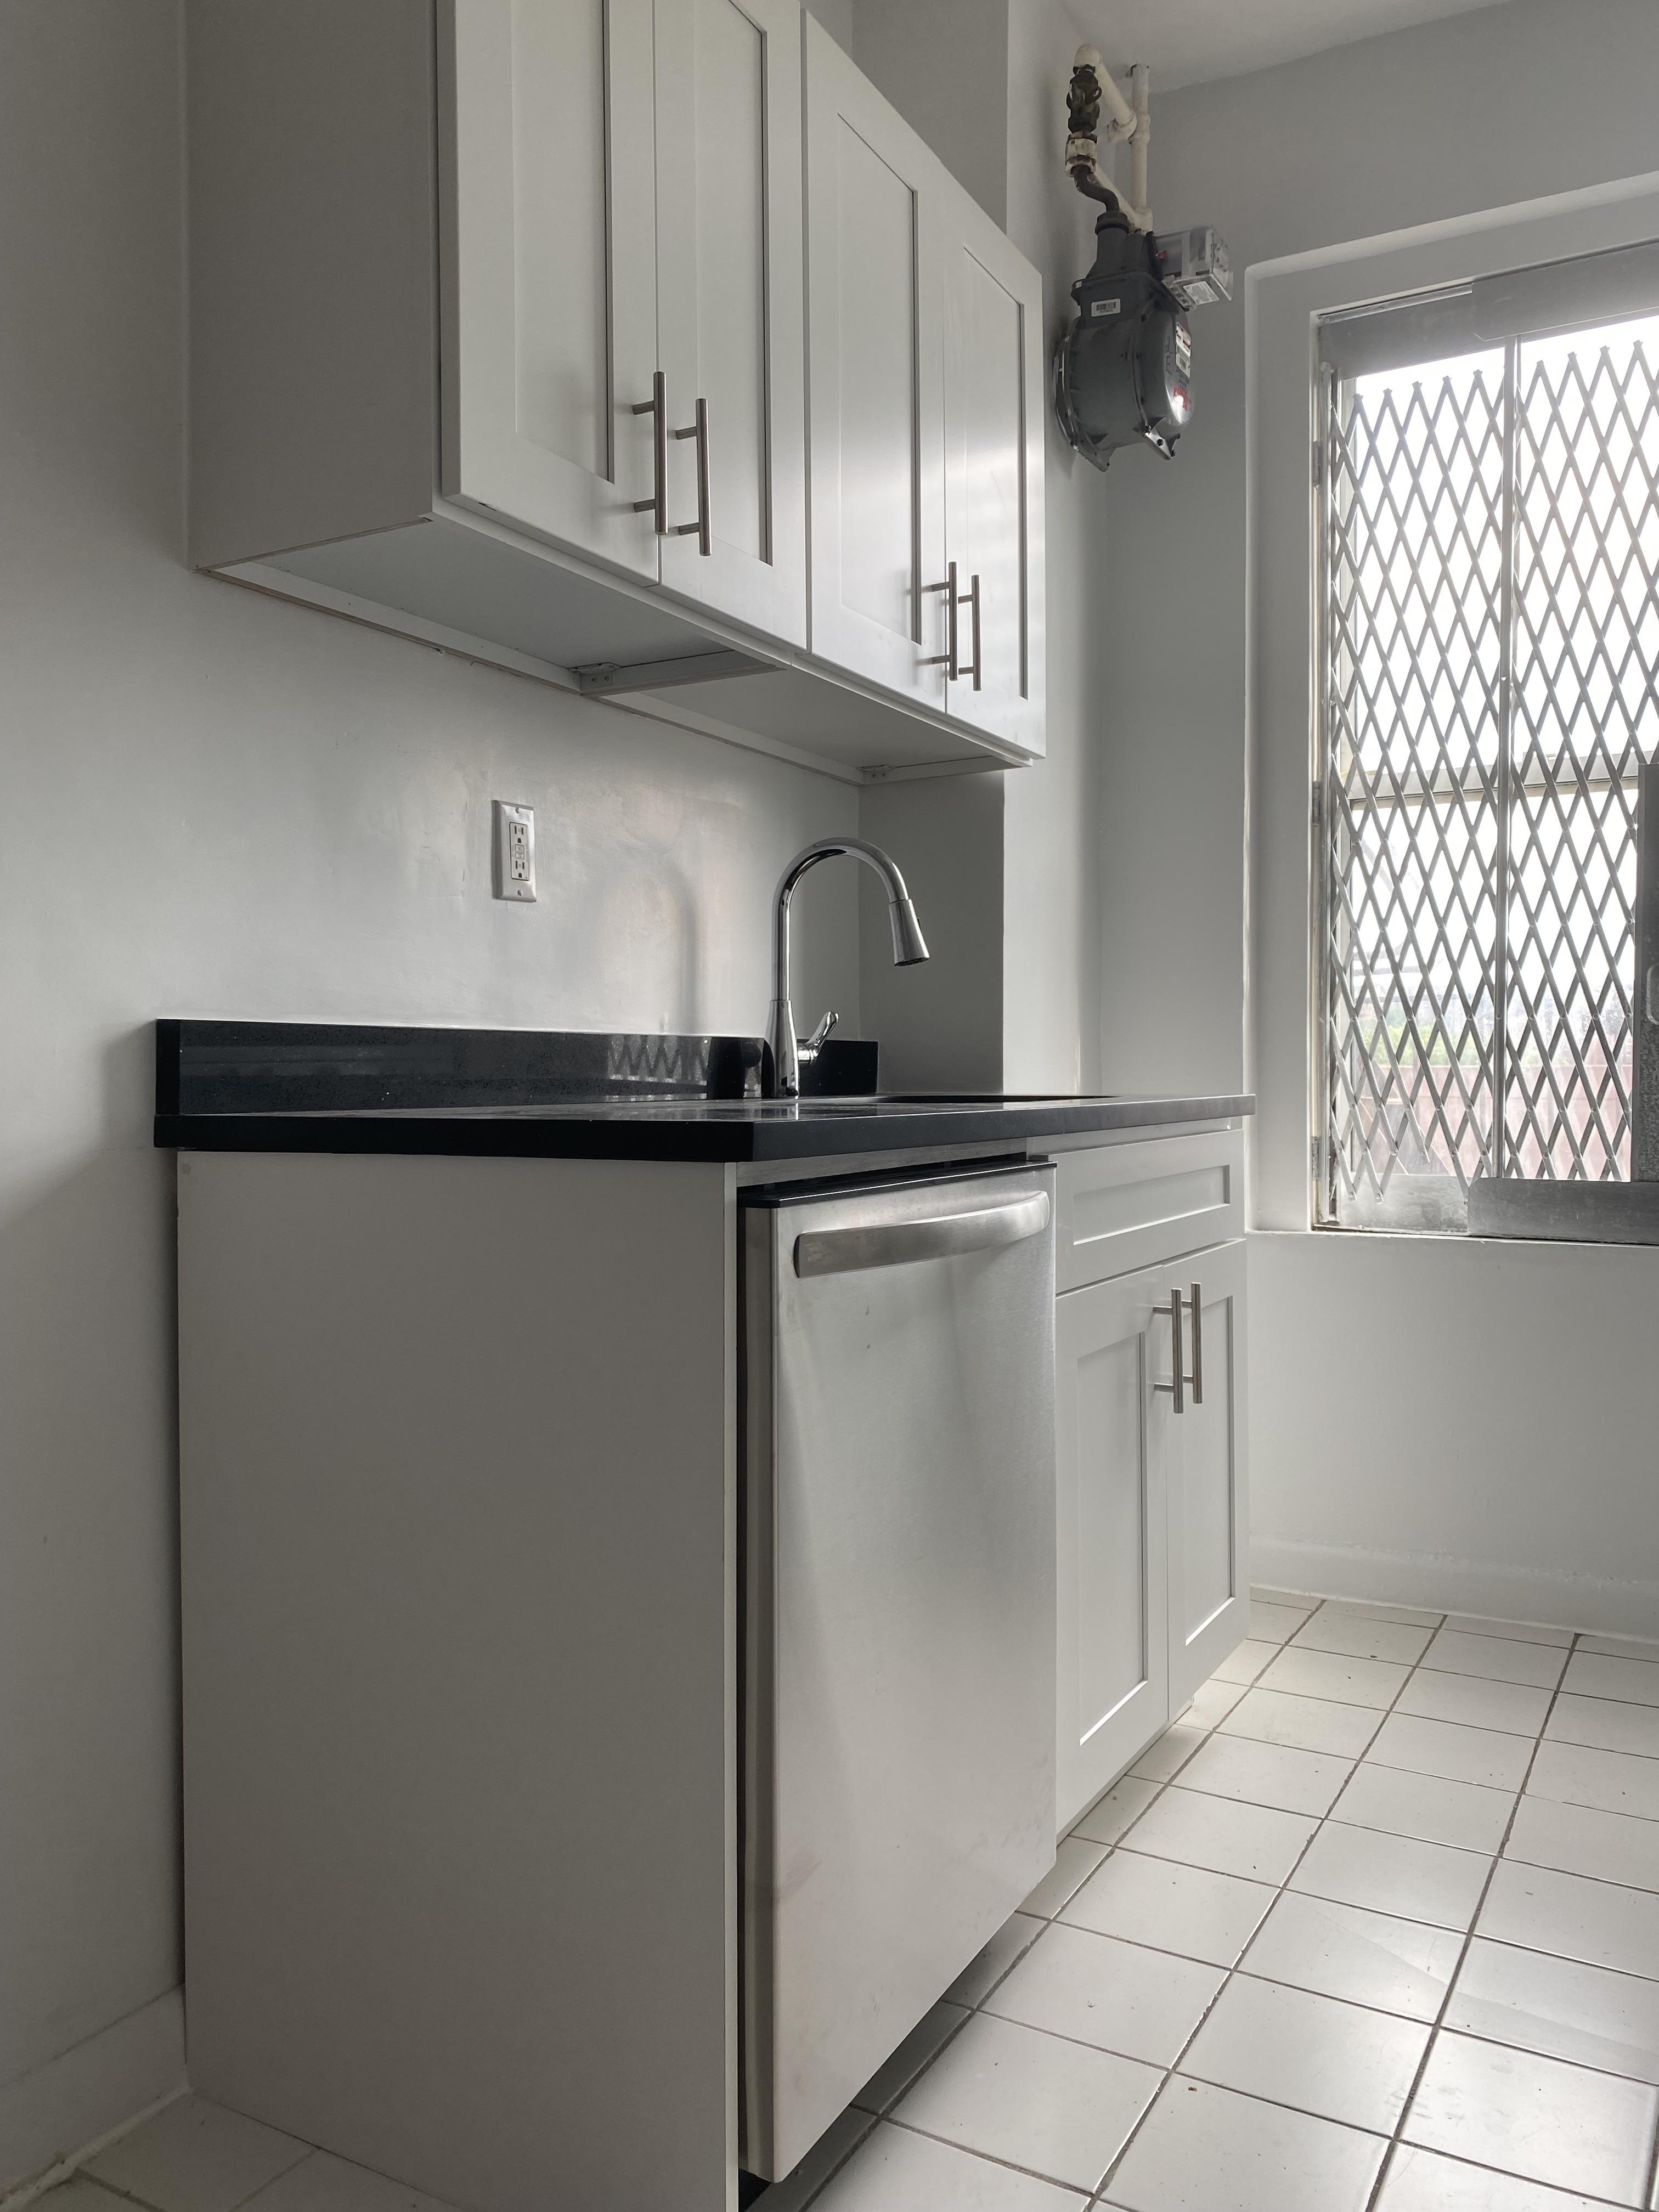 226 West 242nd Street Fieldston Bronx NY 10471